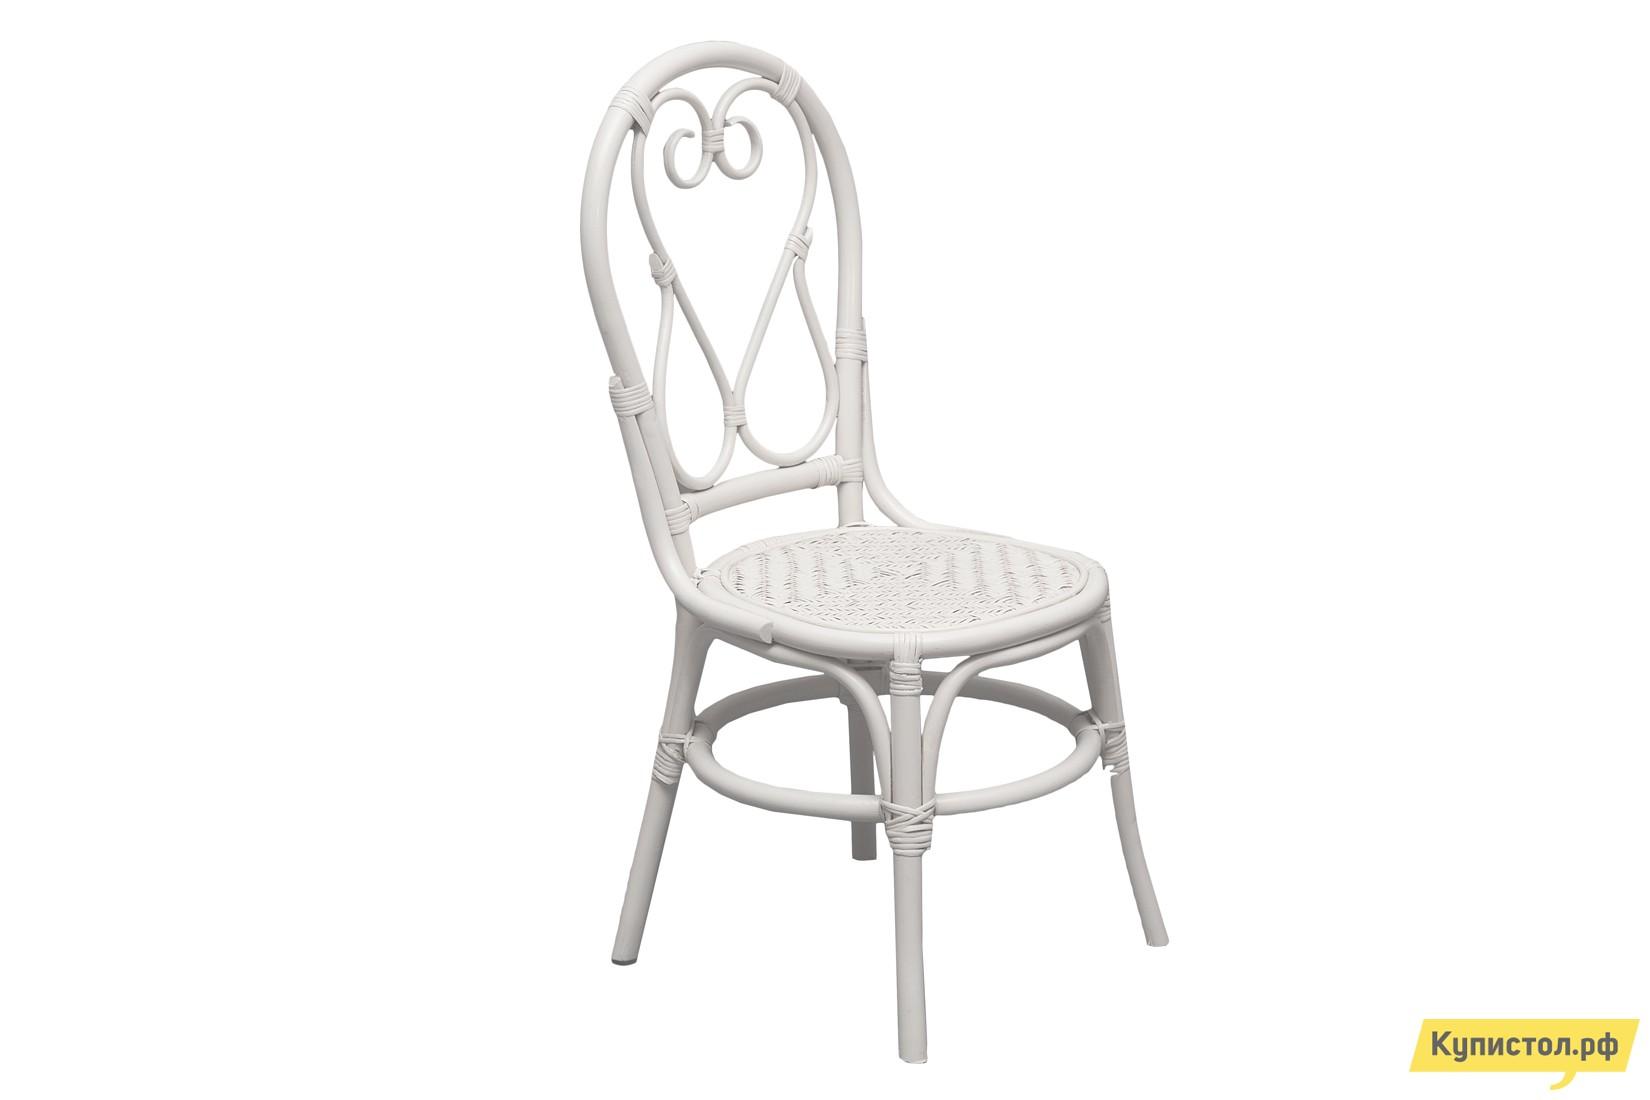 Садовое кресло Tetchair Бистро Butter White